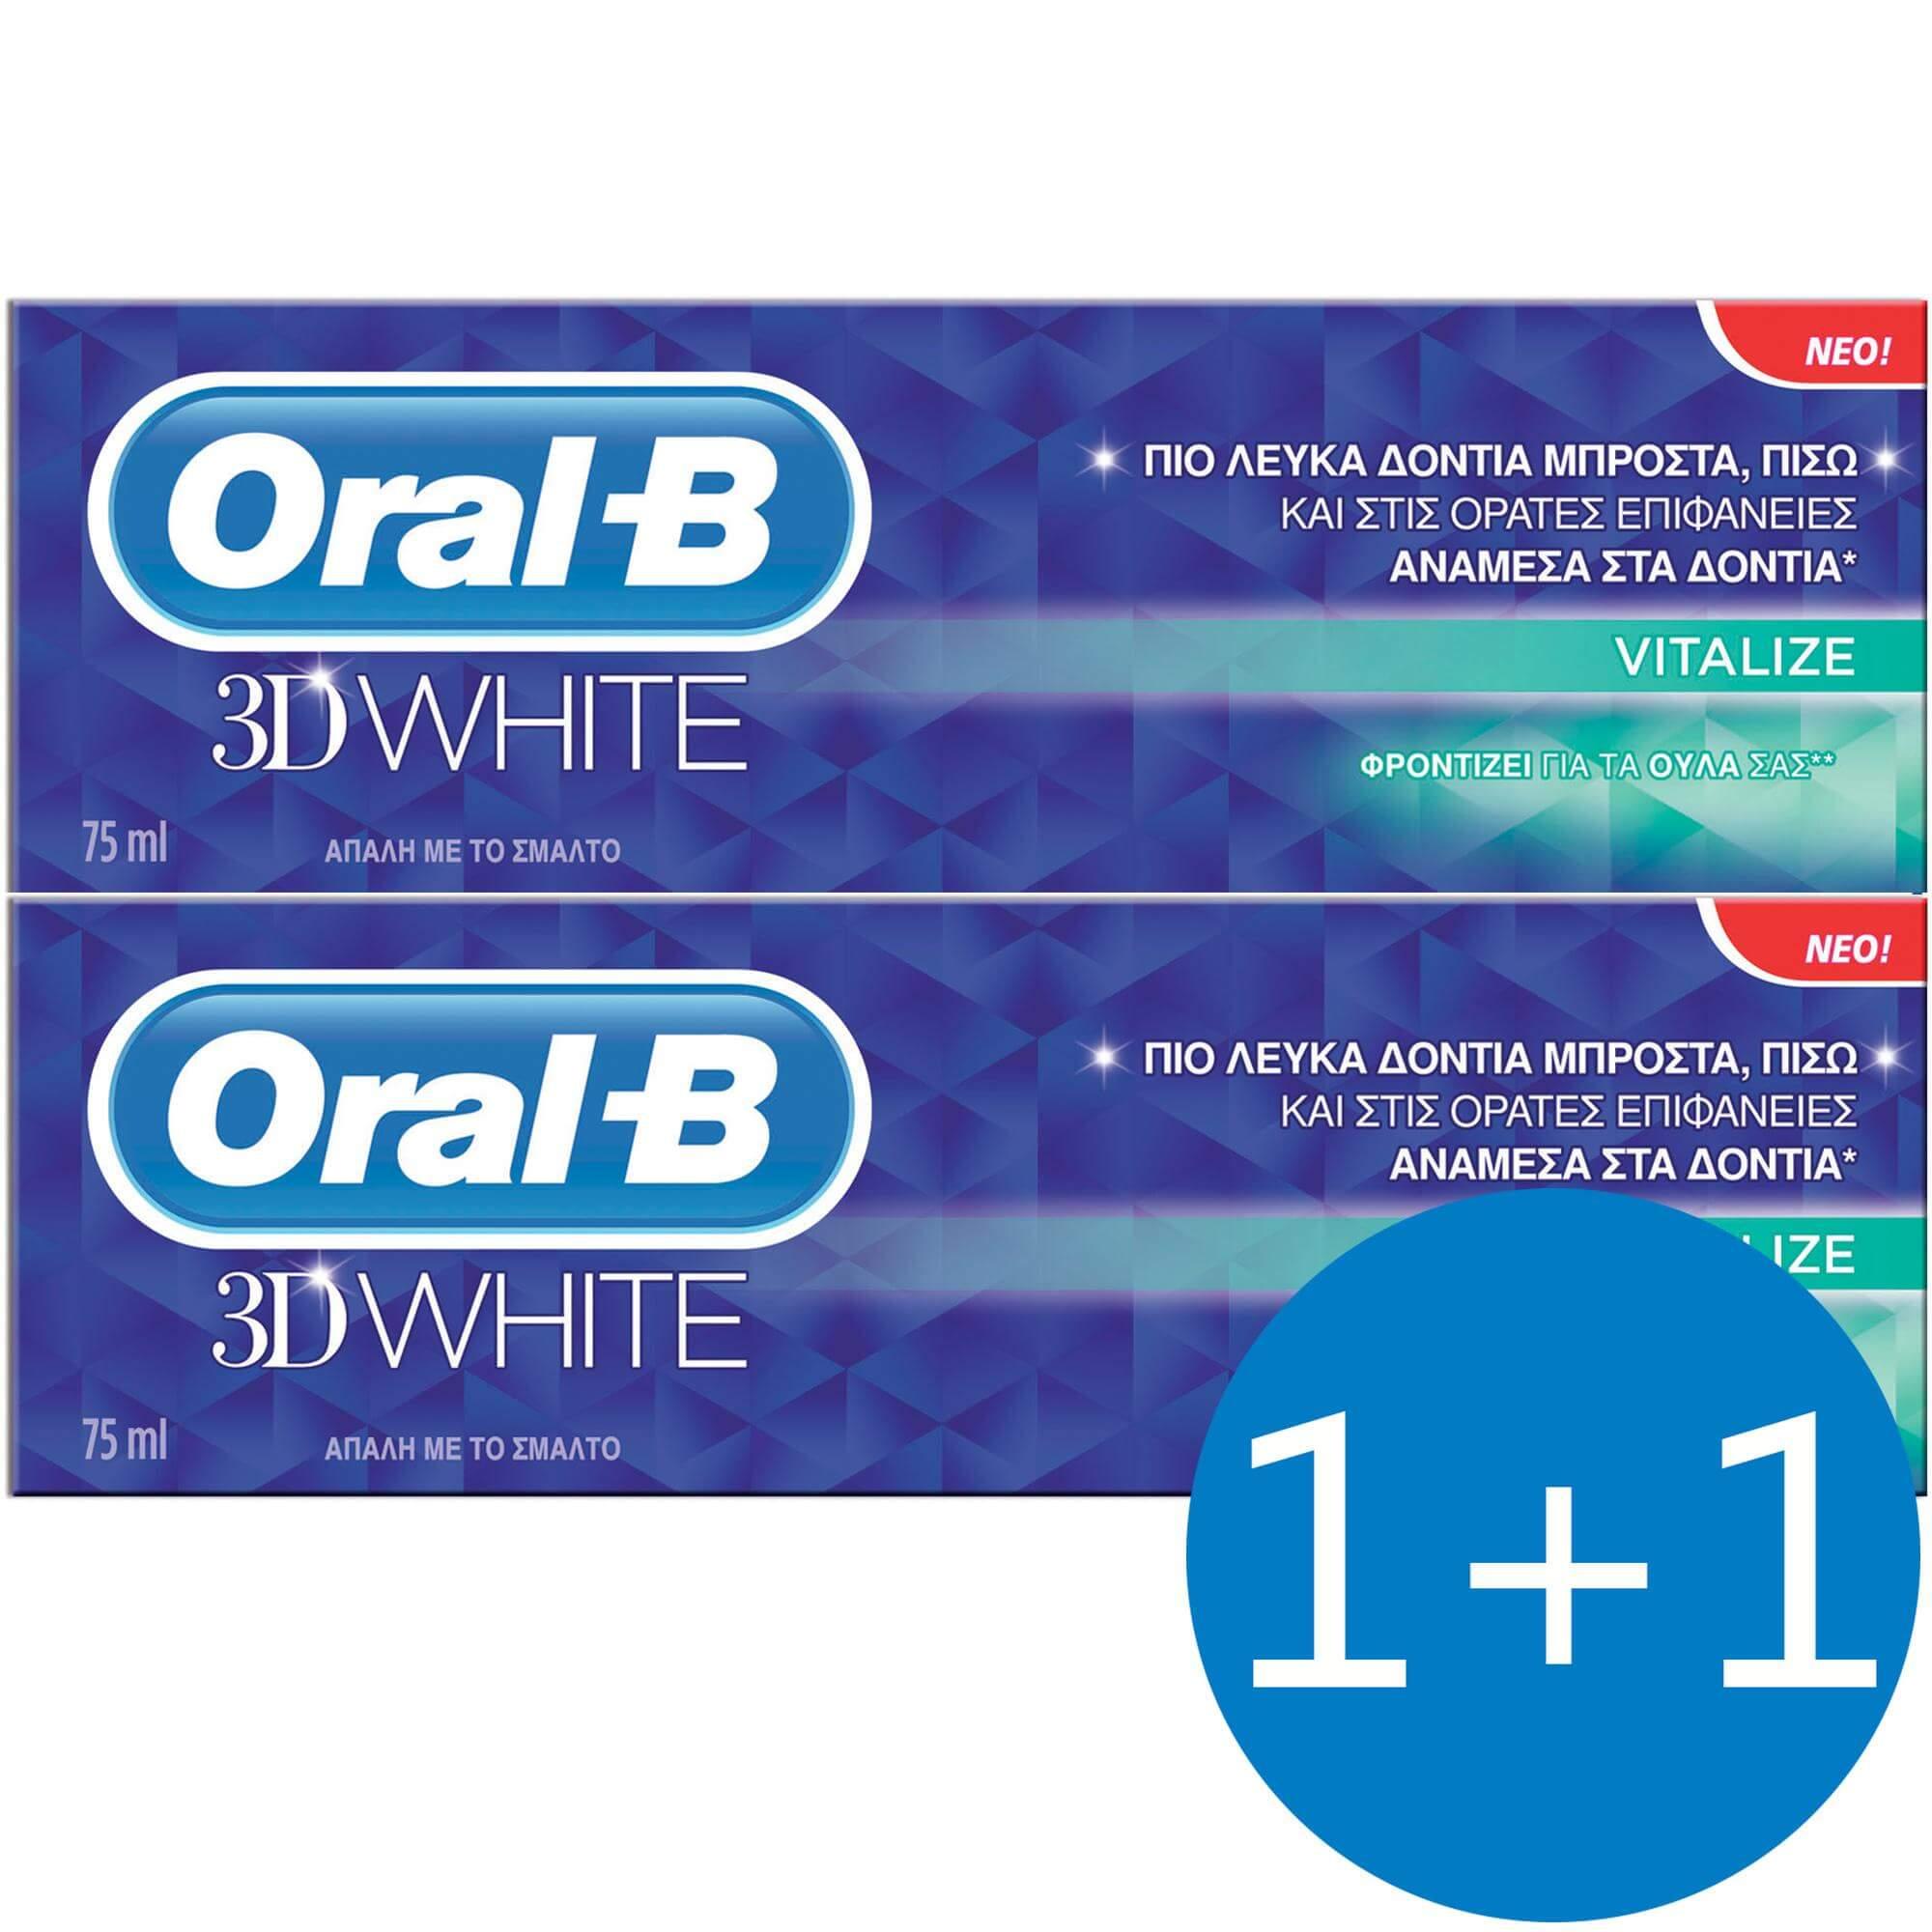 Oral-B Πακέτο Προσφοράς 3D White Vitalize Ειδική Φροντίδα για τα Ούλα 75ml Προσφορά 1+1 Δώρο